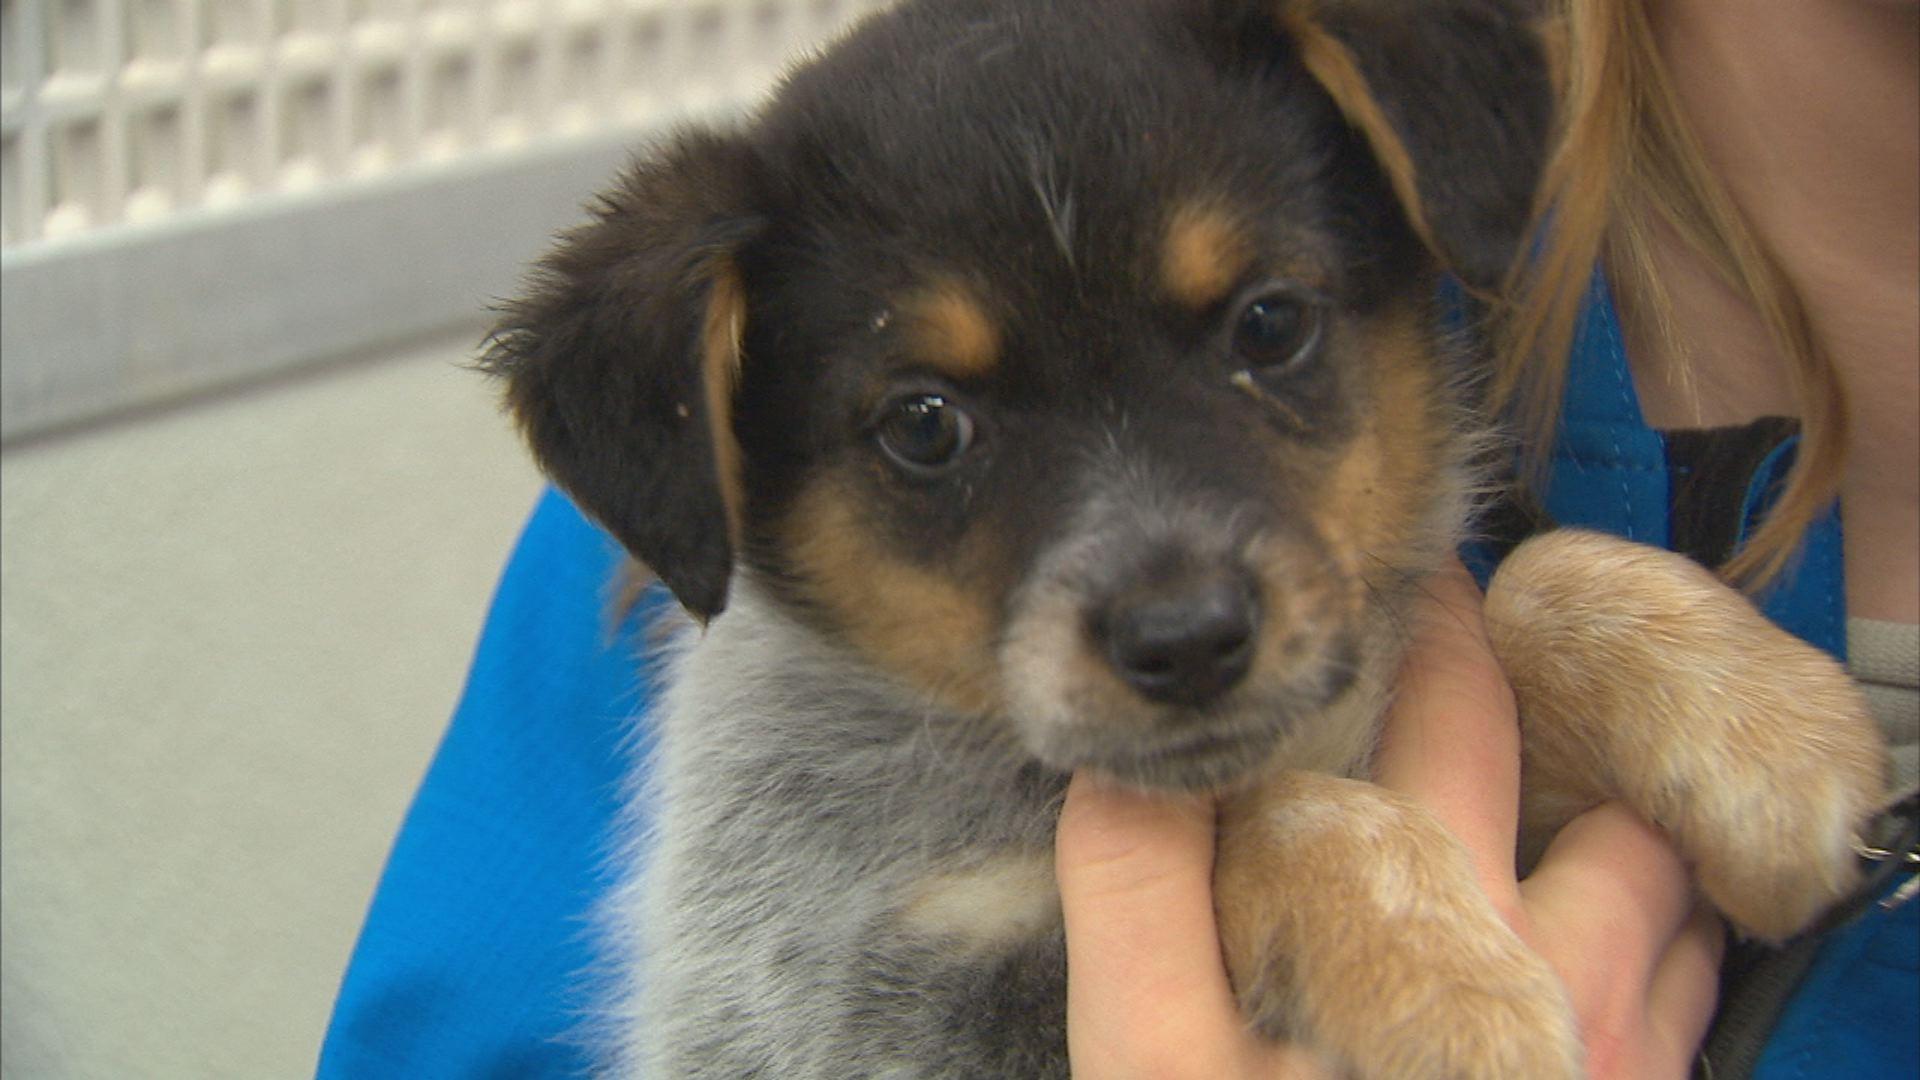 SpokAnimal is full of puppies! Go get one today!